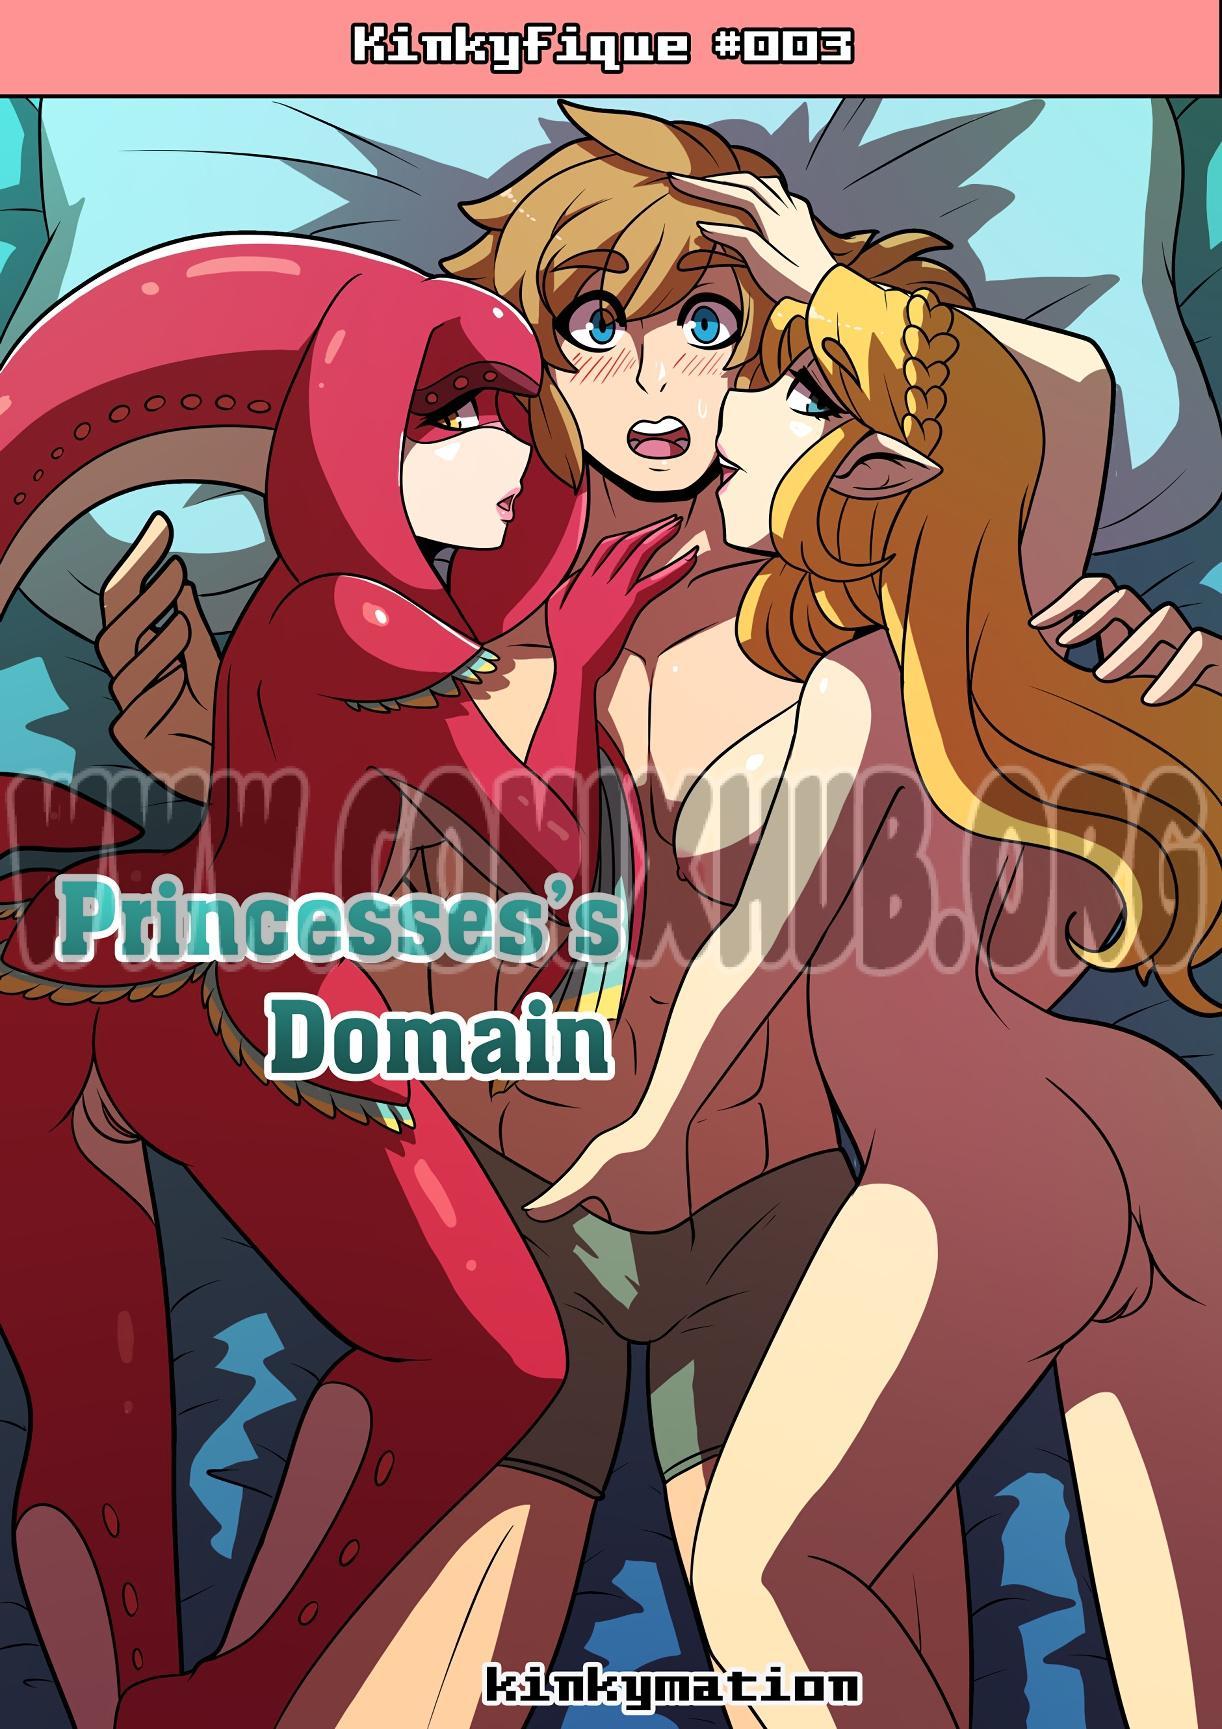 Princesses's Domain Oral sex, Anal Sex, Big Tits, Blowjob, Creampie, Cum Shots, cunnilingus, Elf, Fantasy, Furry, Straight, Threesome